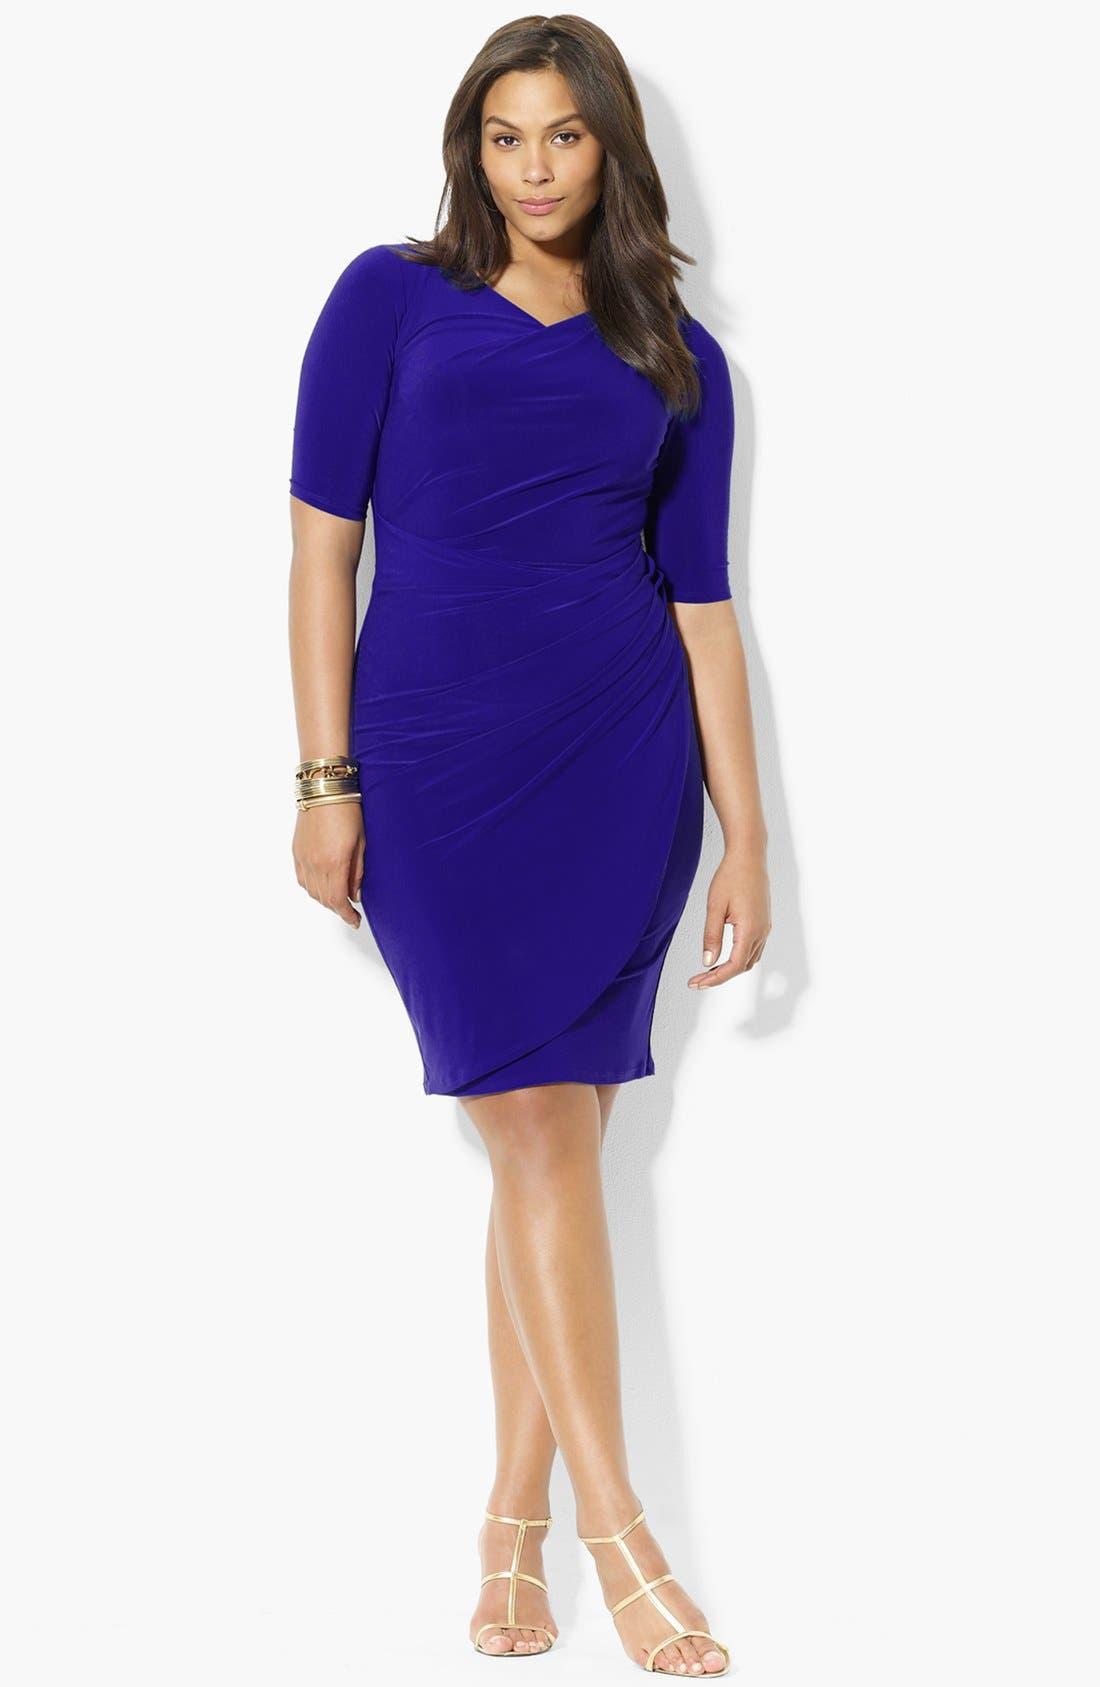 Alternate Image 1 Selected - Lauren Ralph Lauren Jersey Sheath Dress (Plus Size)